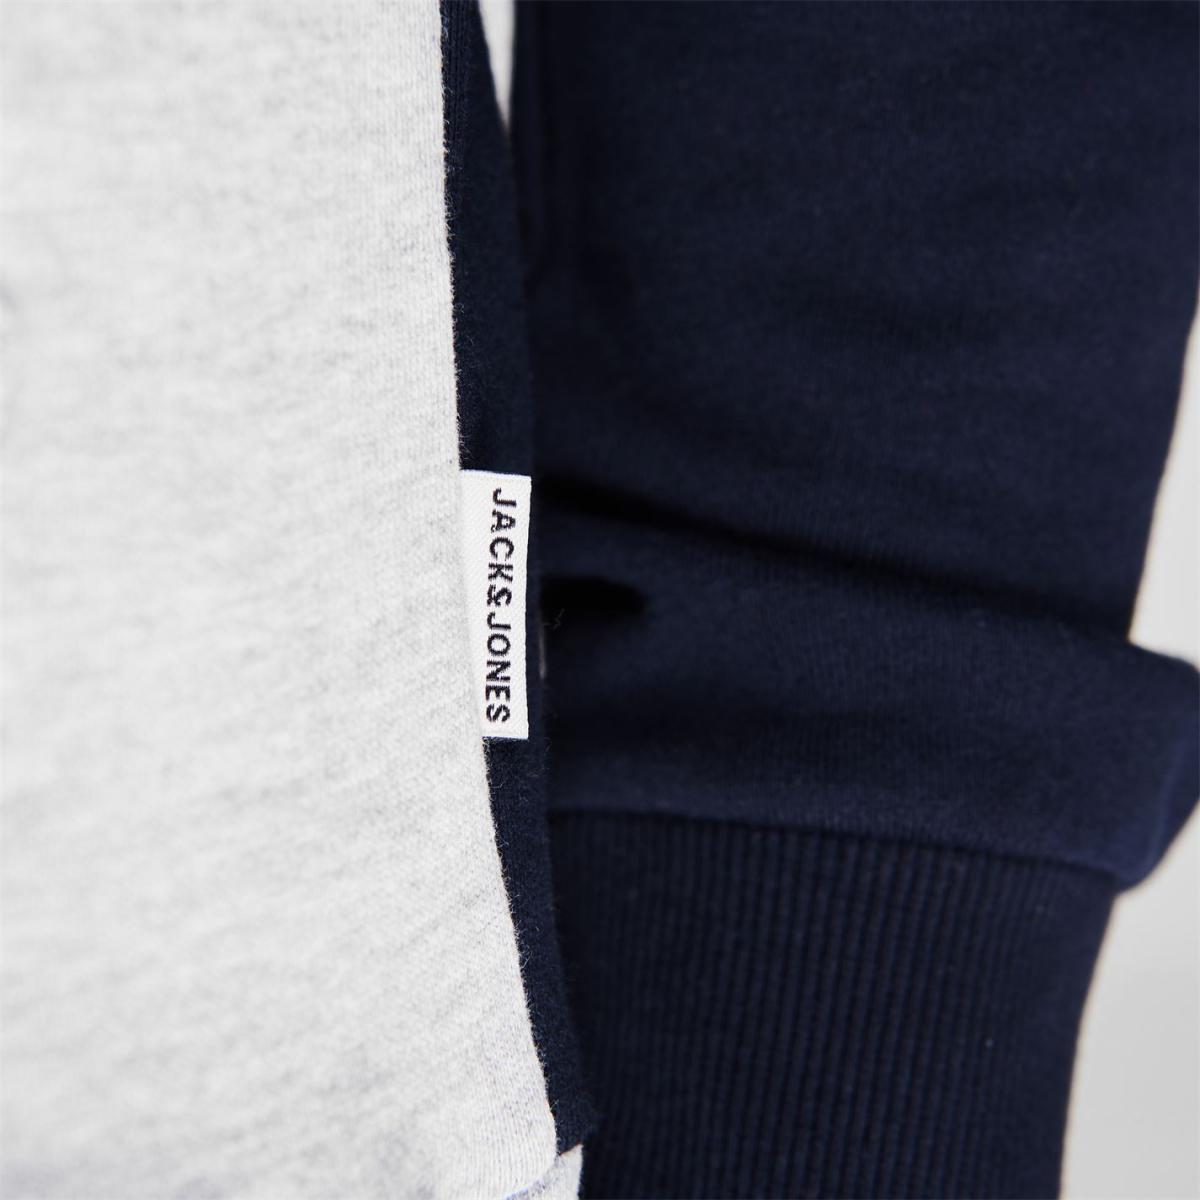 Jack And Jones Kapuzenpullover Pullover Herren Sweatshirt Kapuzenjacke OTH 2630